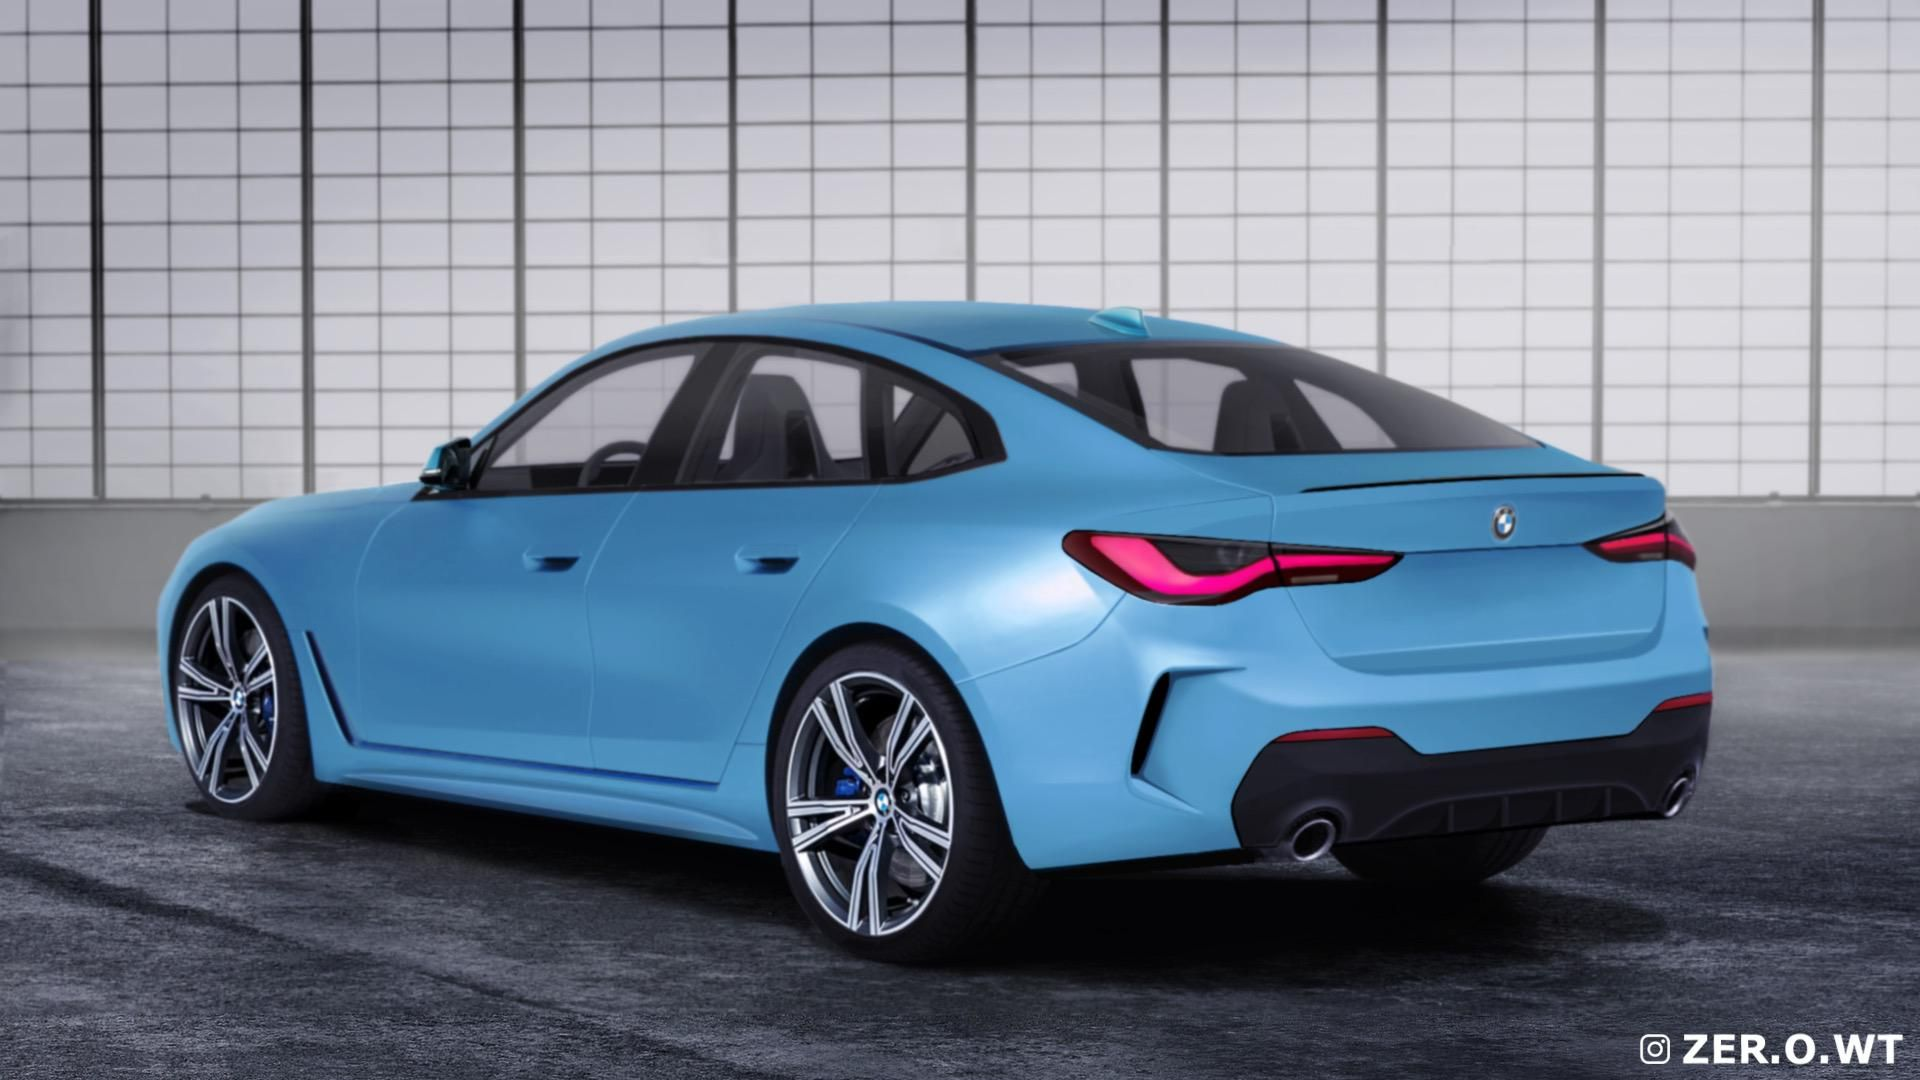 2021 Bmw 4 Series Gran Coupe Gets A Series Of Renderings In 2020